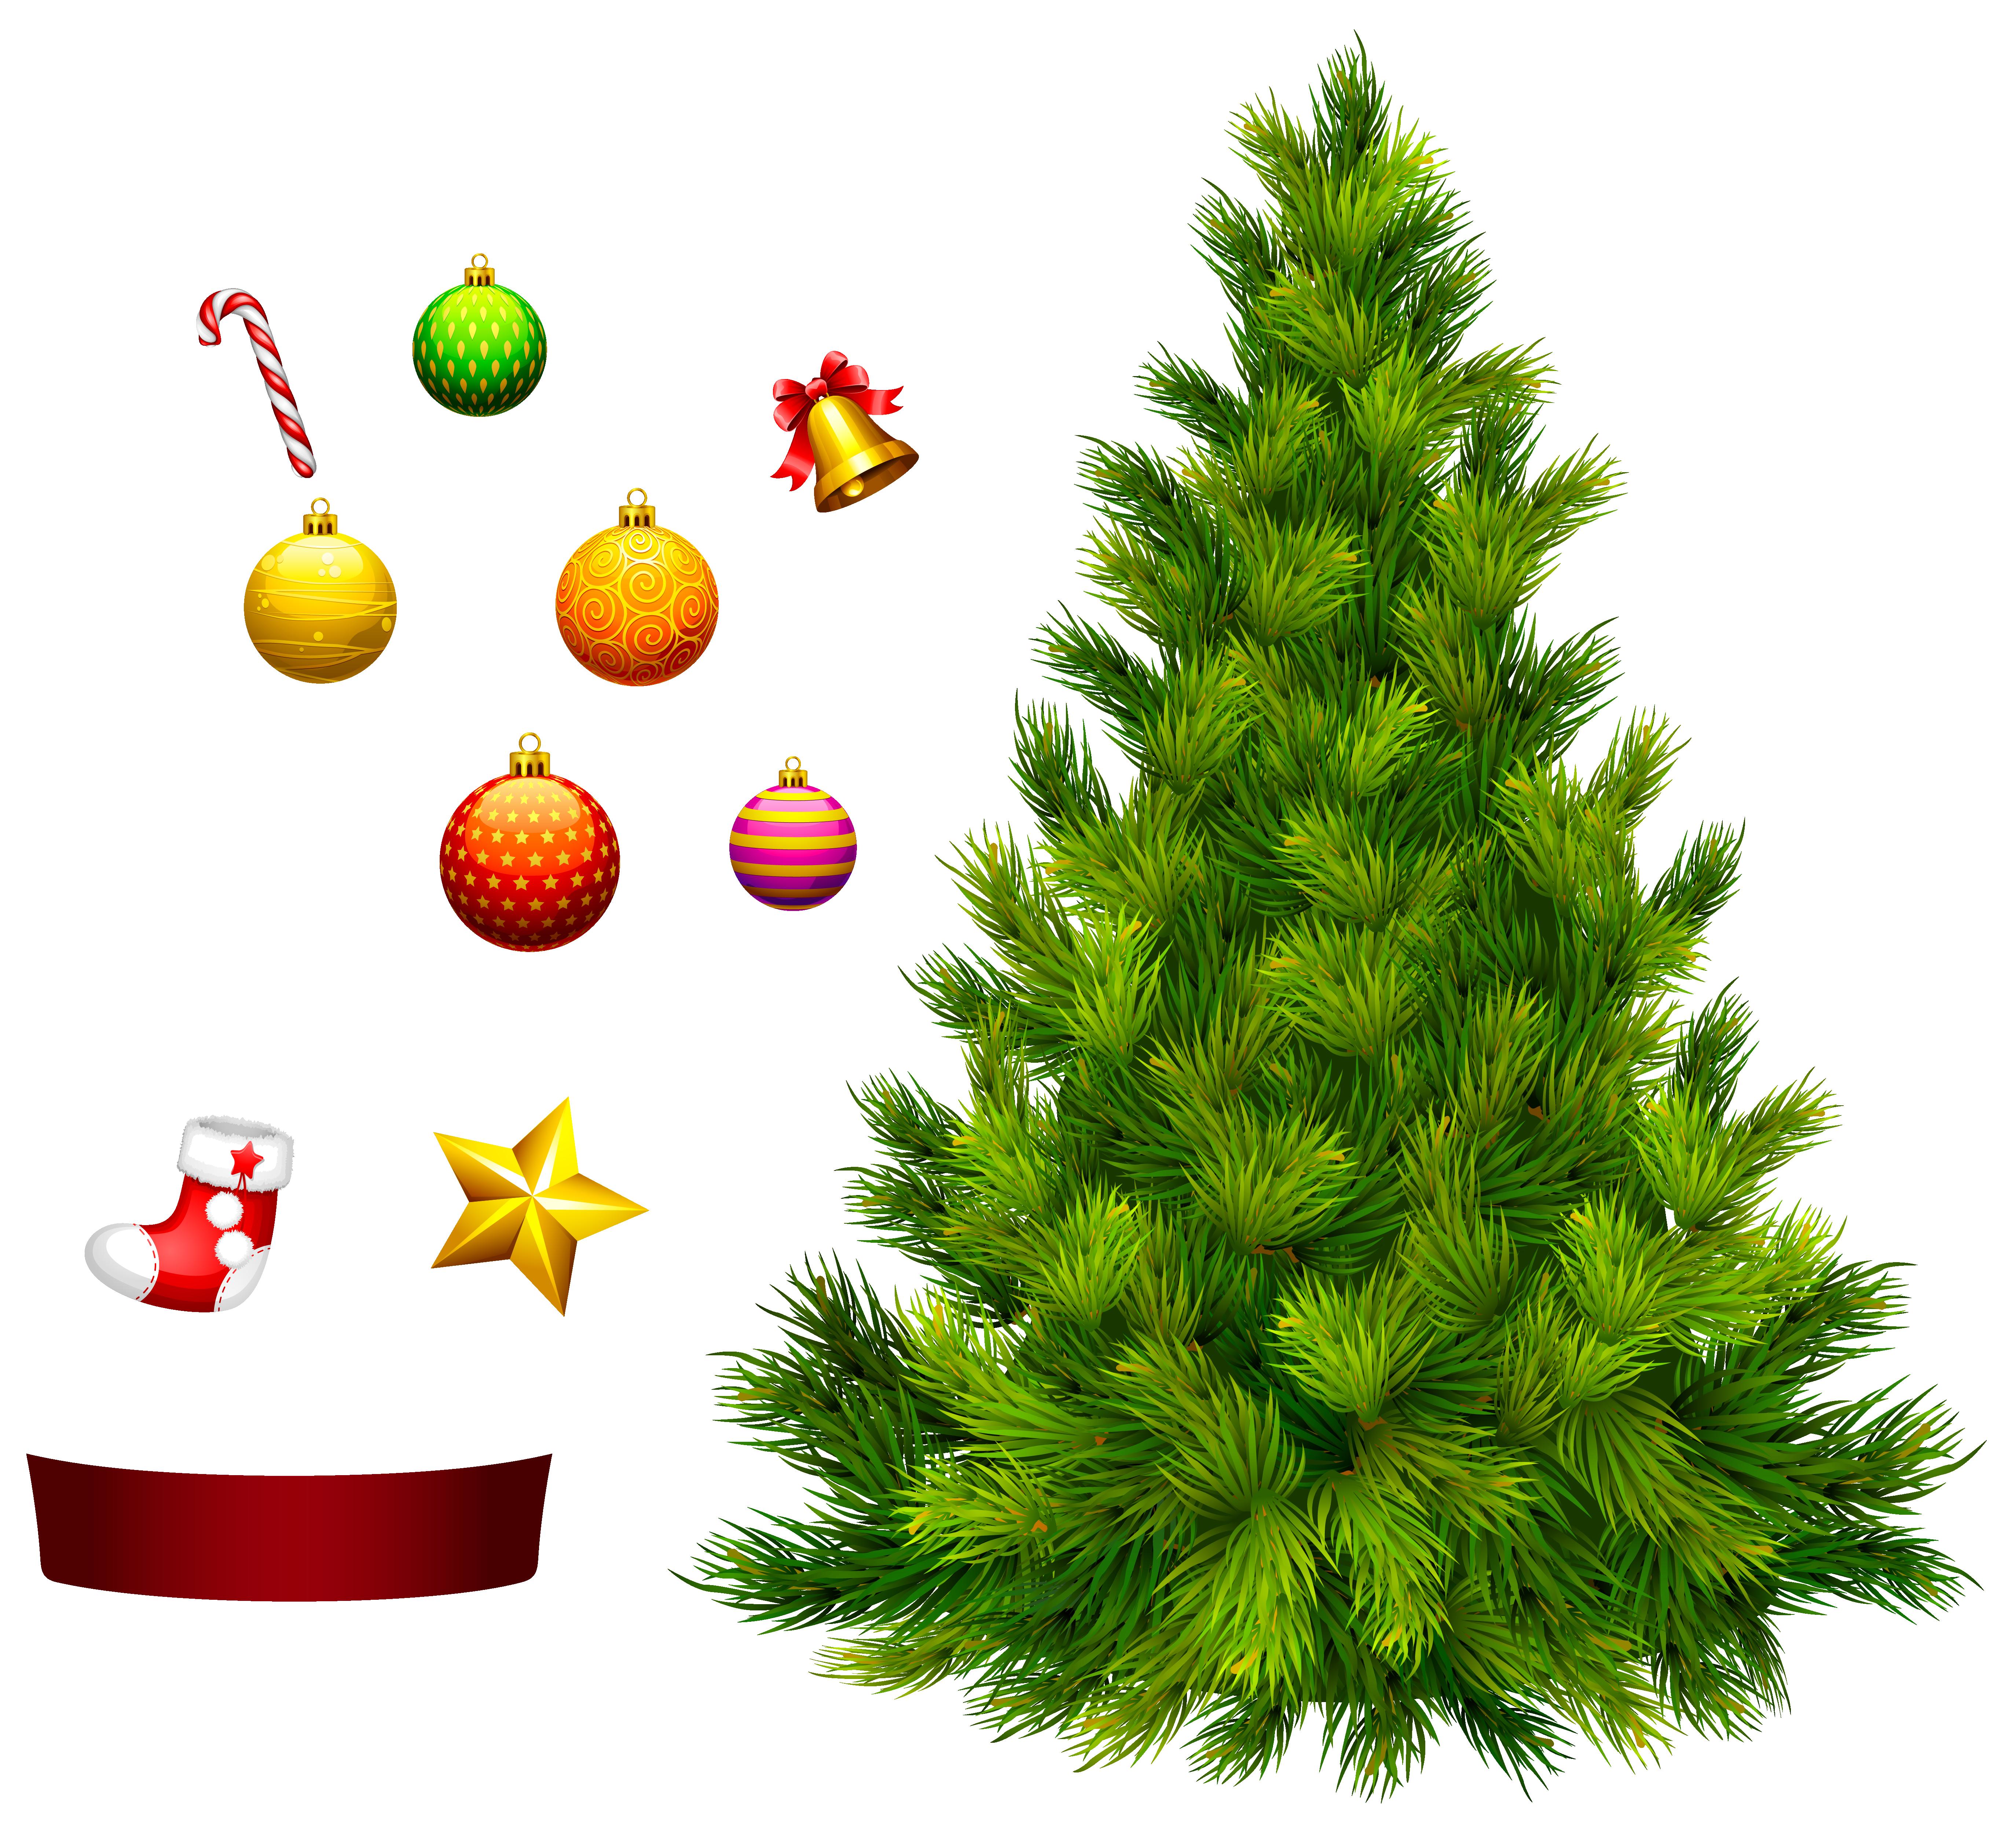 Christmas tree decoration clipart image freeuse download Xmas Tree for Decoration PNG Clipart | Gallery Yopriceville - High ... image freeuse download